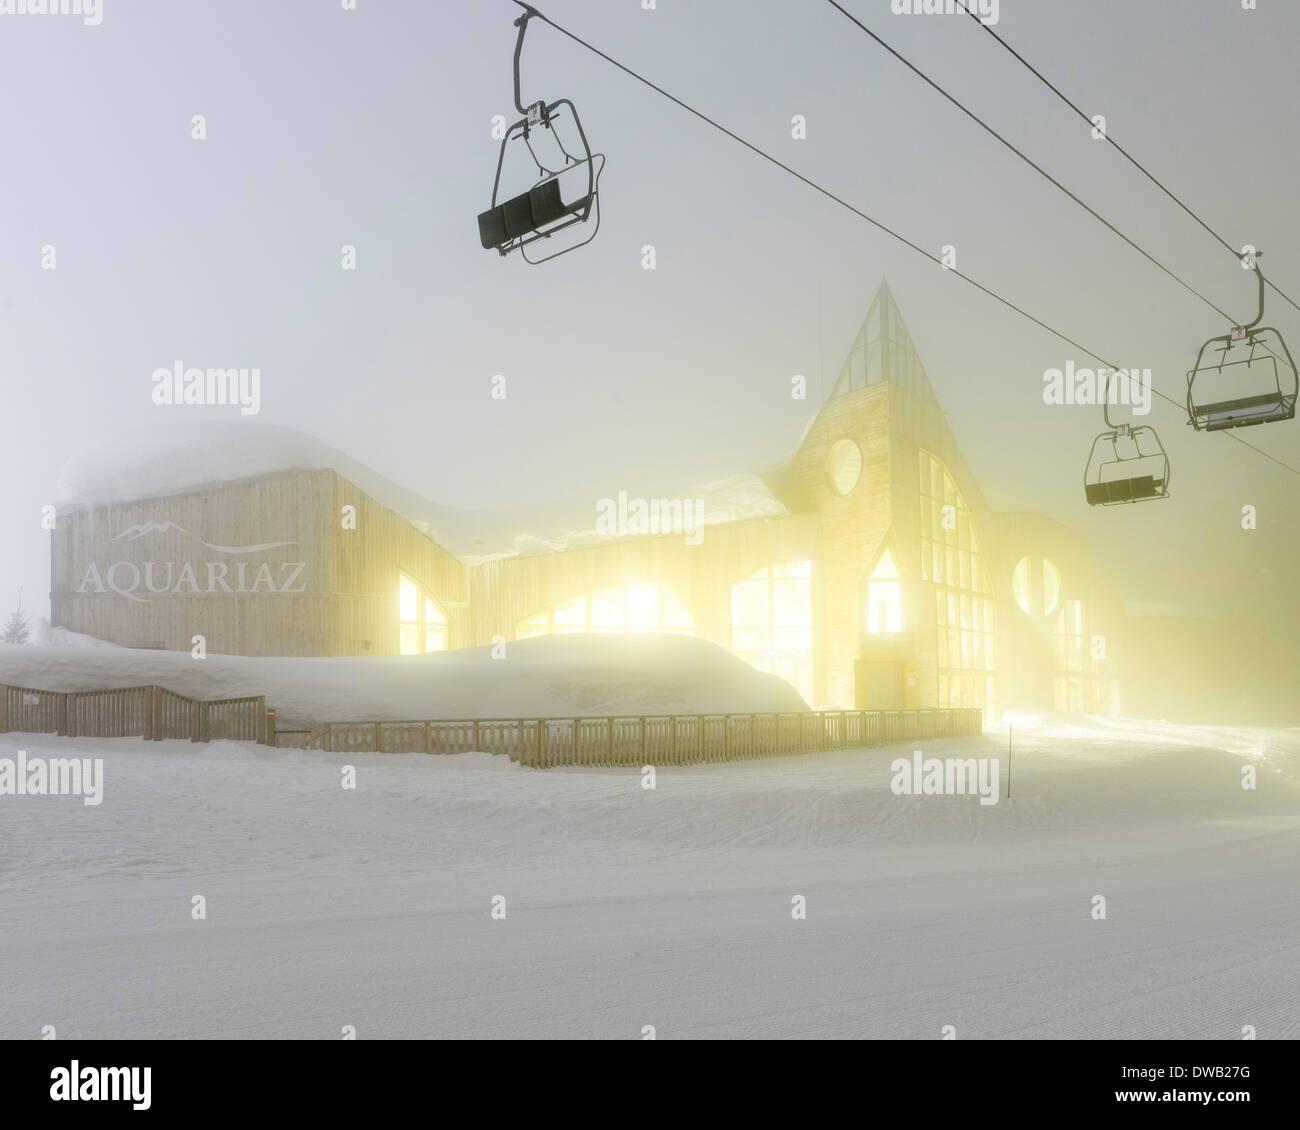 Avoriaz, Avoriaz, France. Architect: Jacques Labro, Simon Cloutier, Jean-Jacques Orzoni, 2014. Aquoriaz (2011) Winter. Stock Photo